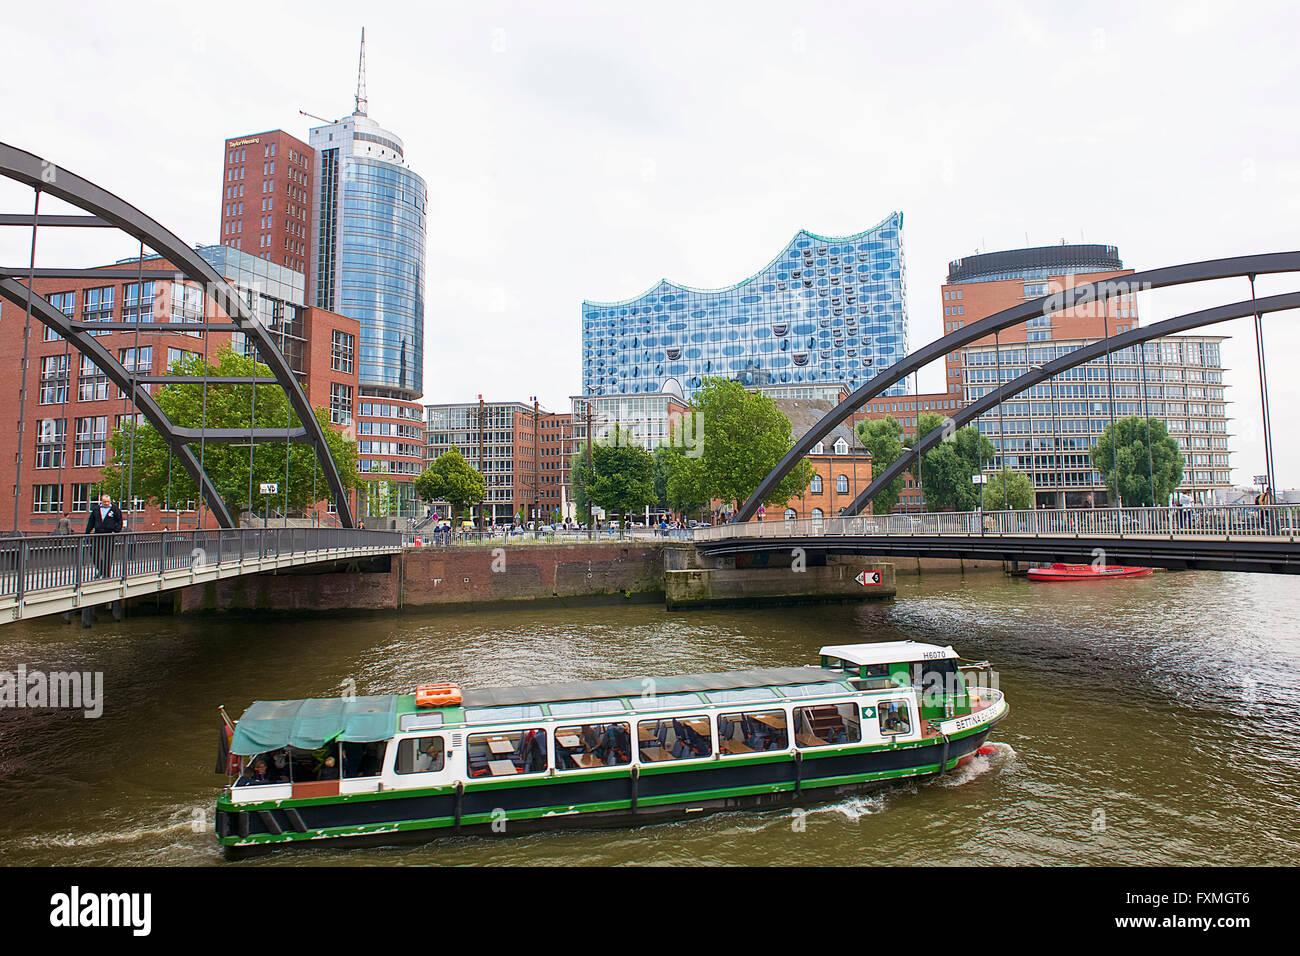 Hanseatic Trade Center, Hamburg, Germany - Stock Image